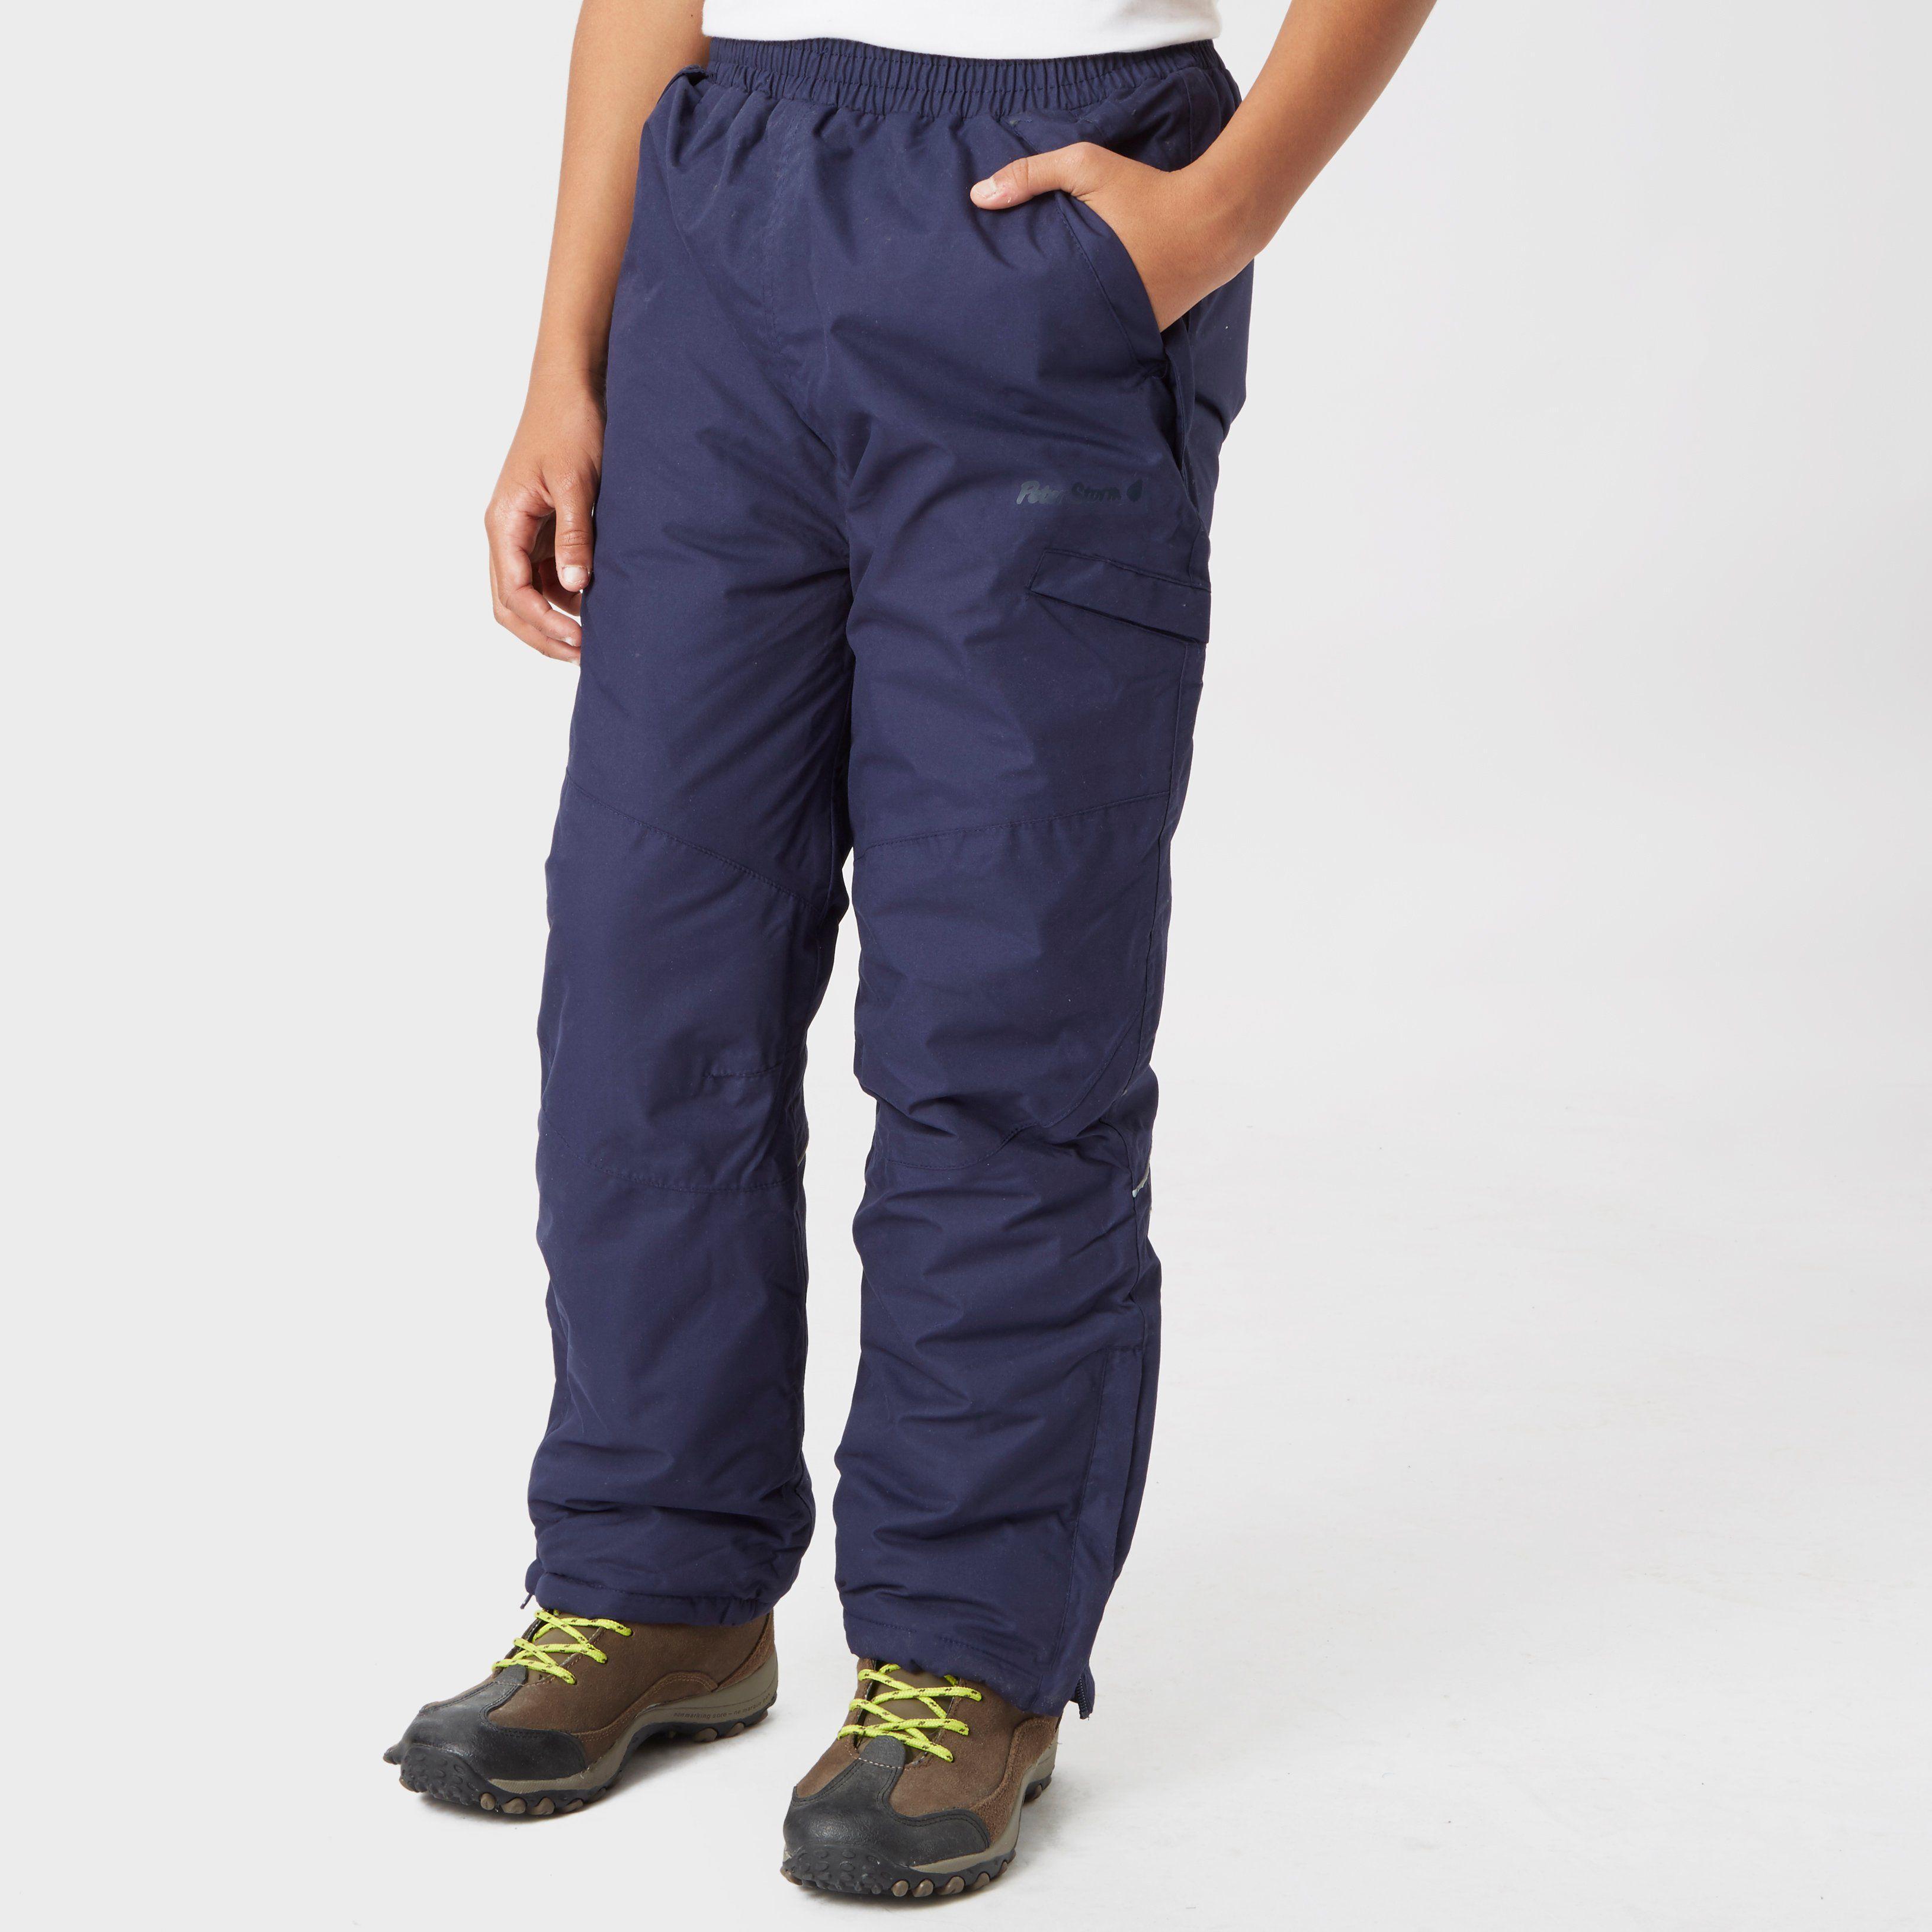 PETER STORM Kids' Unisex Typhoon Trousers